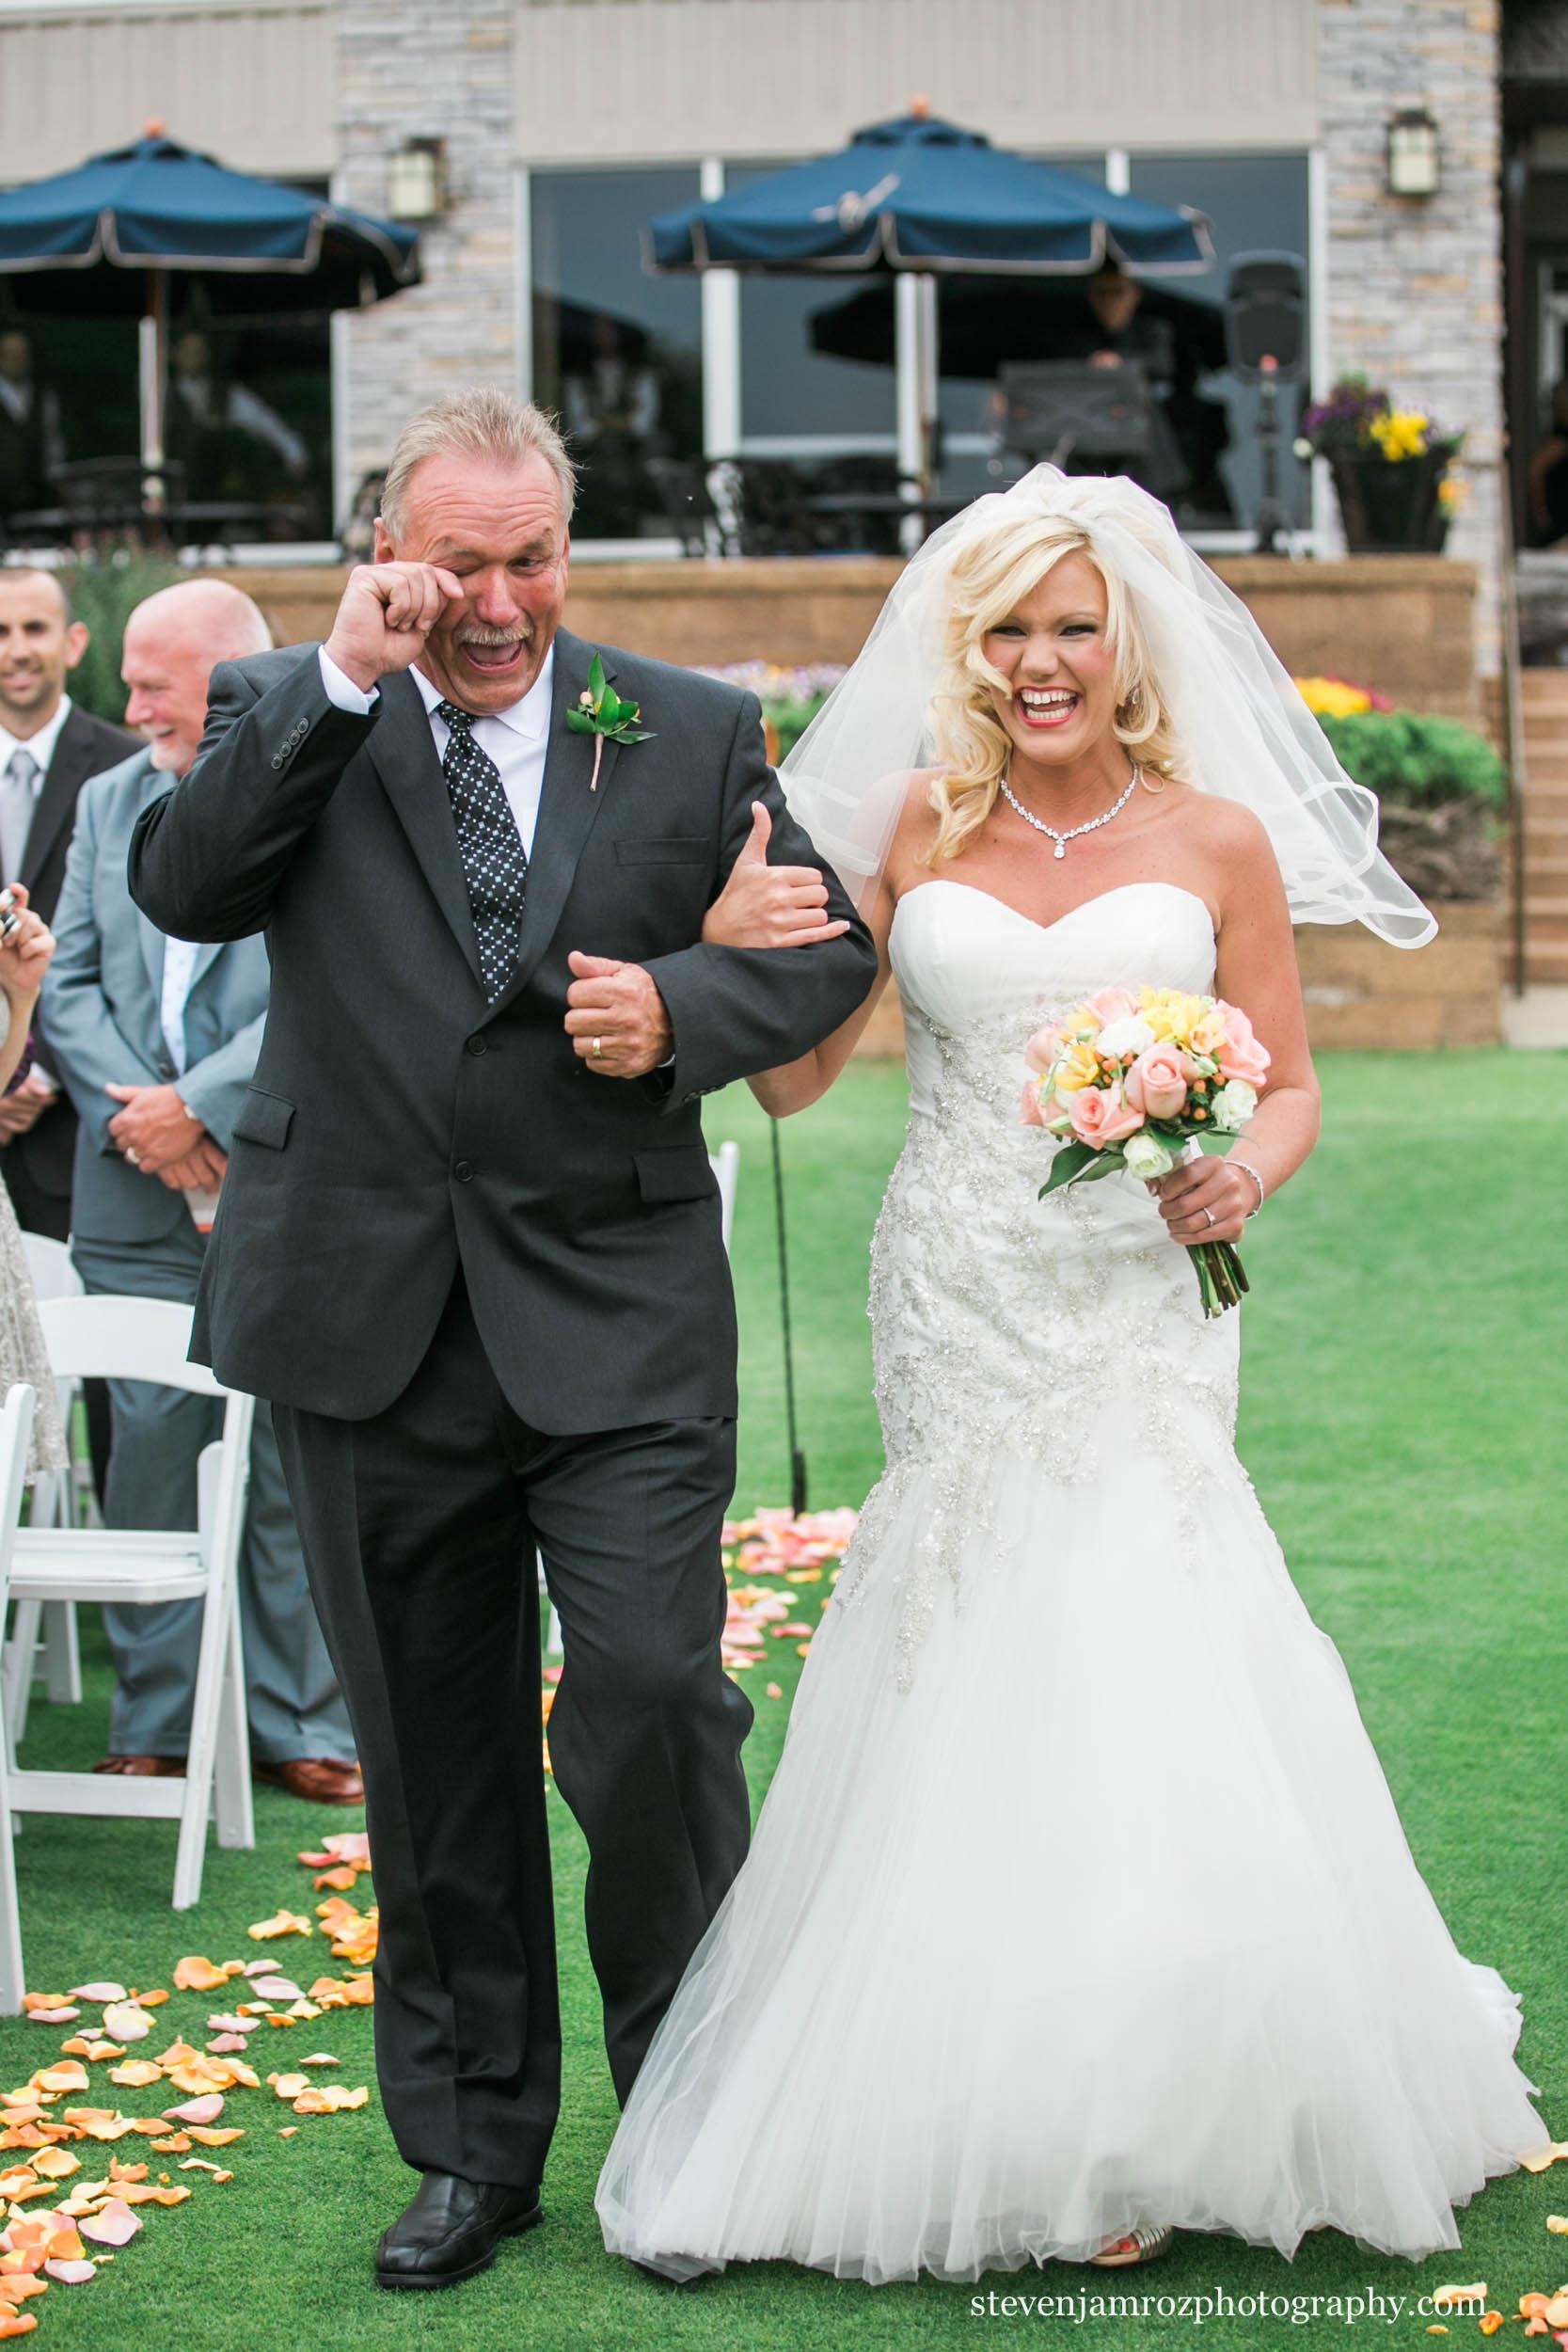 raleigh-country-club-wedding-ceremony-photographer-steven-jamroz-0653.jpg